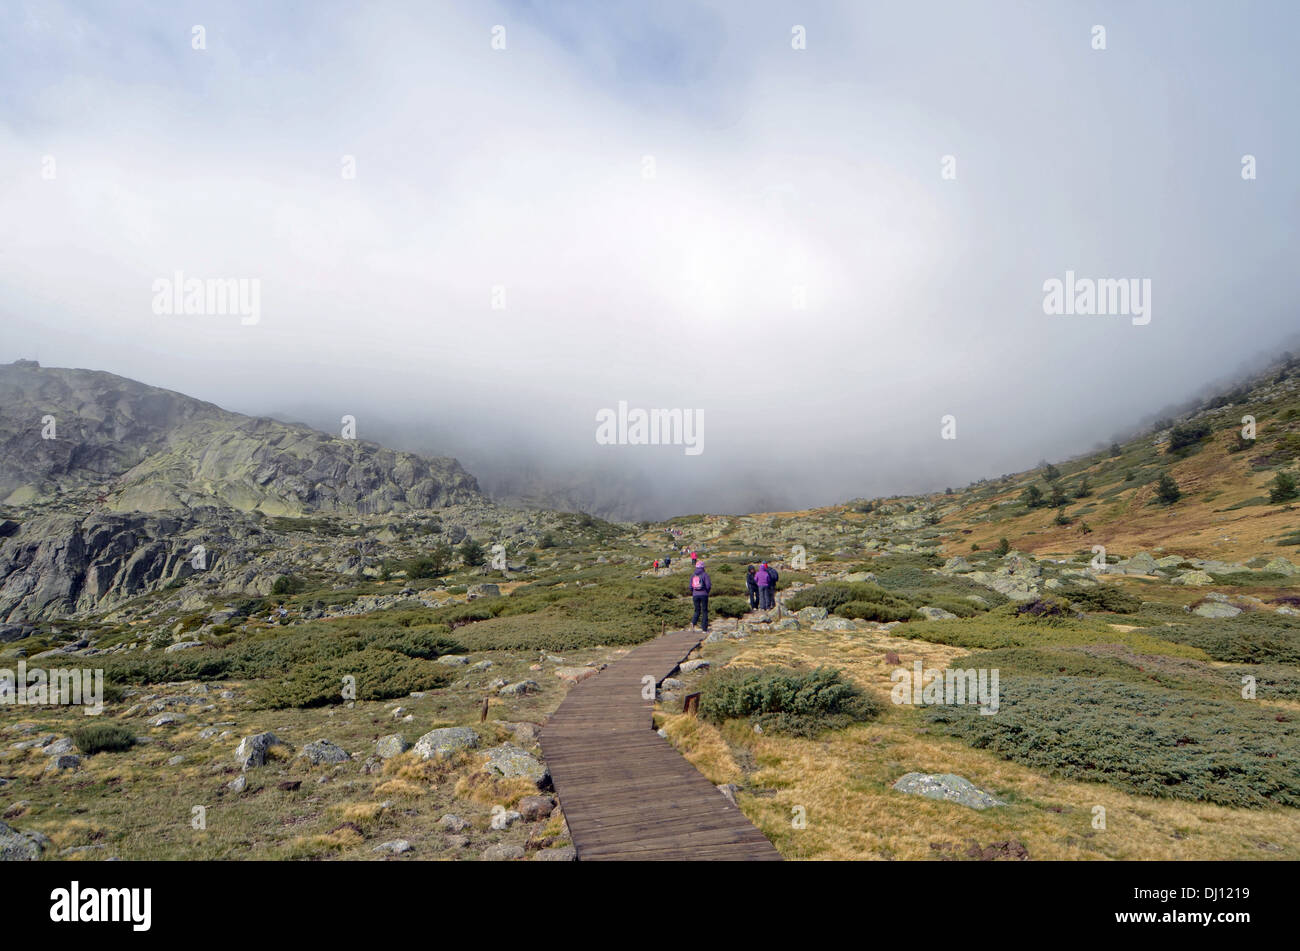 Foggy day in Peñalara, highest mountain peak in the mountain range of Guadarrama, Spain Stock Photo